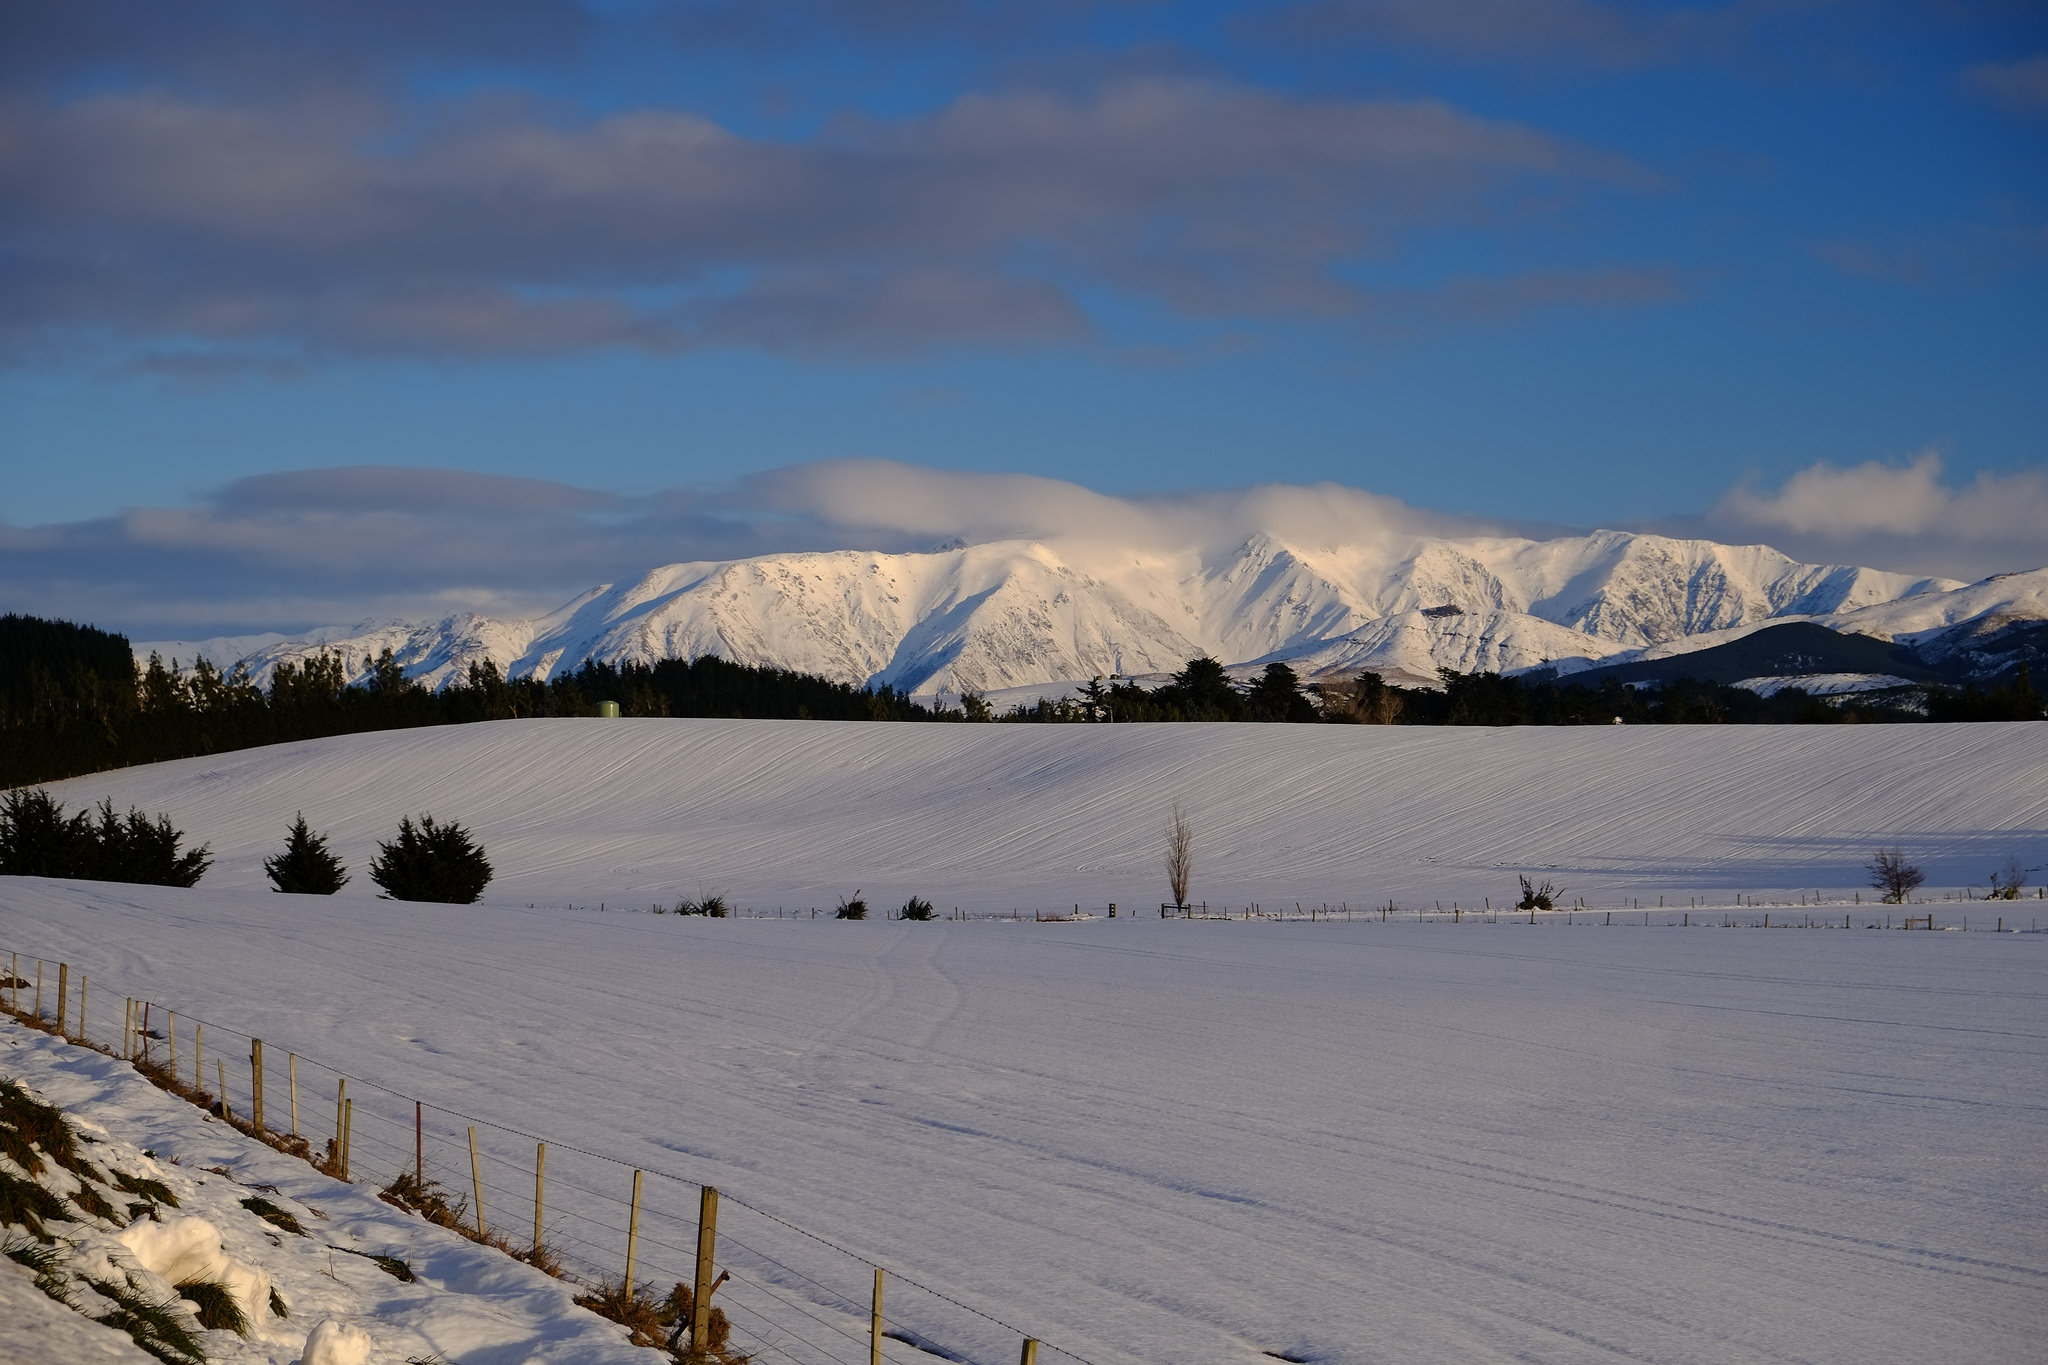 The 10 Best New Zealand Ski Resorts